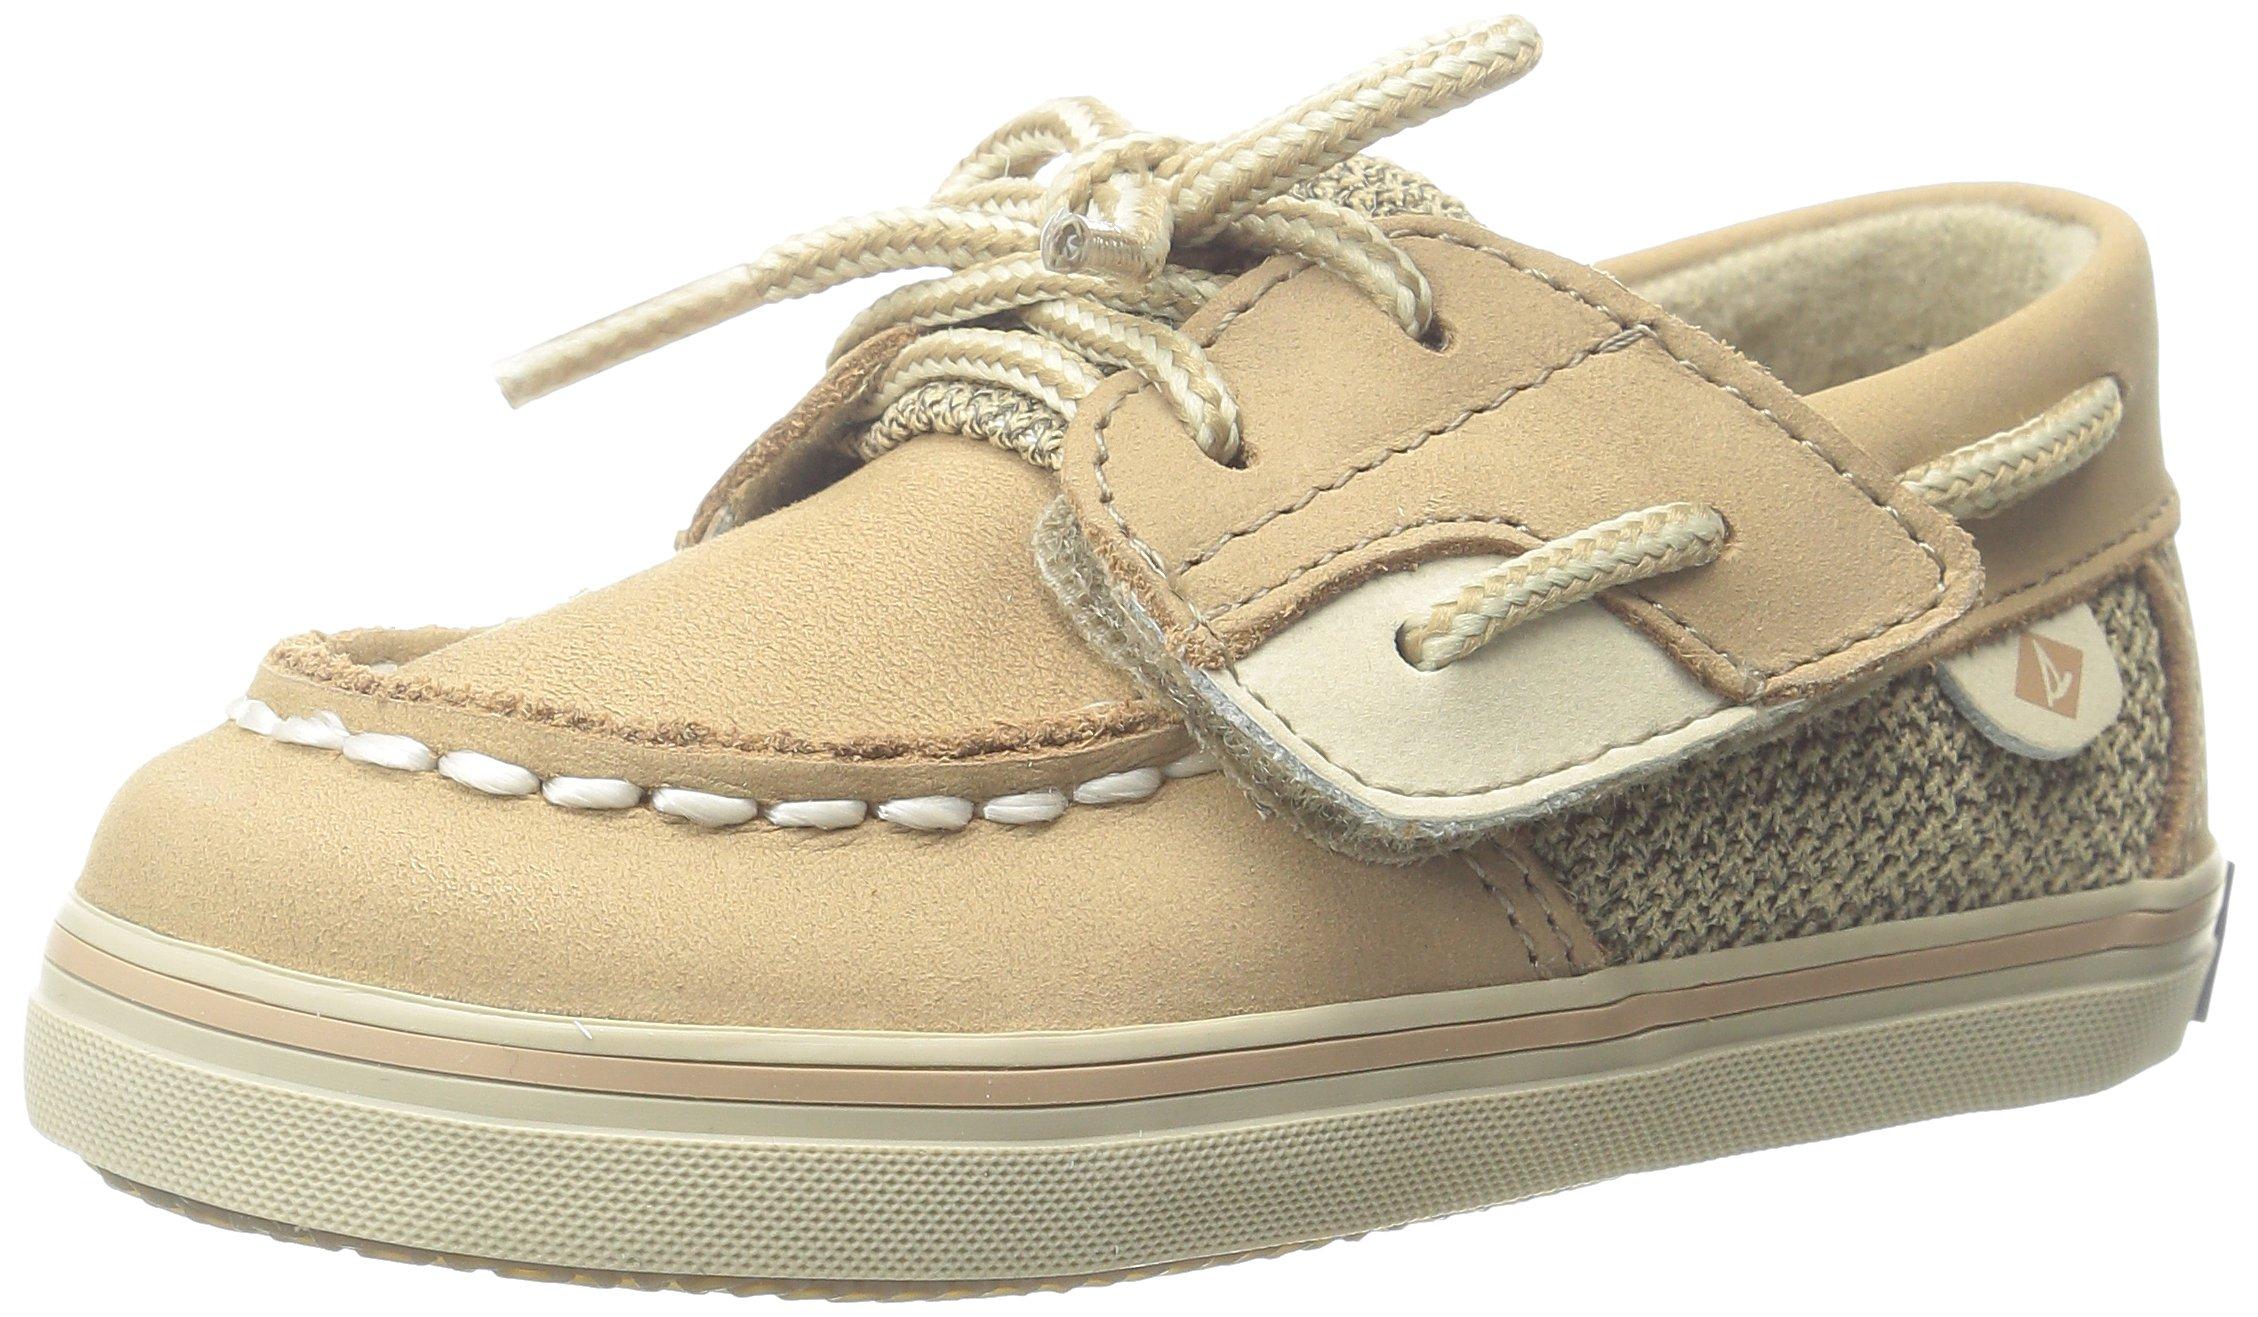 Sperry Bluefish Crib A/C Boat Shoe (Infant/Toddler/Little Kid),Linen, 4 M US Toddler